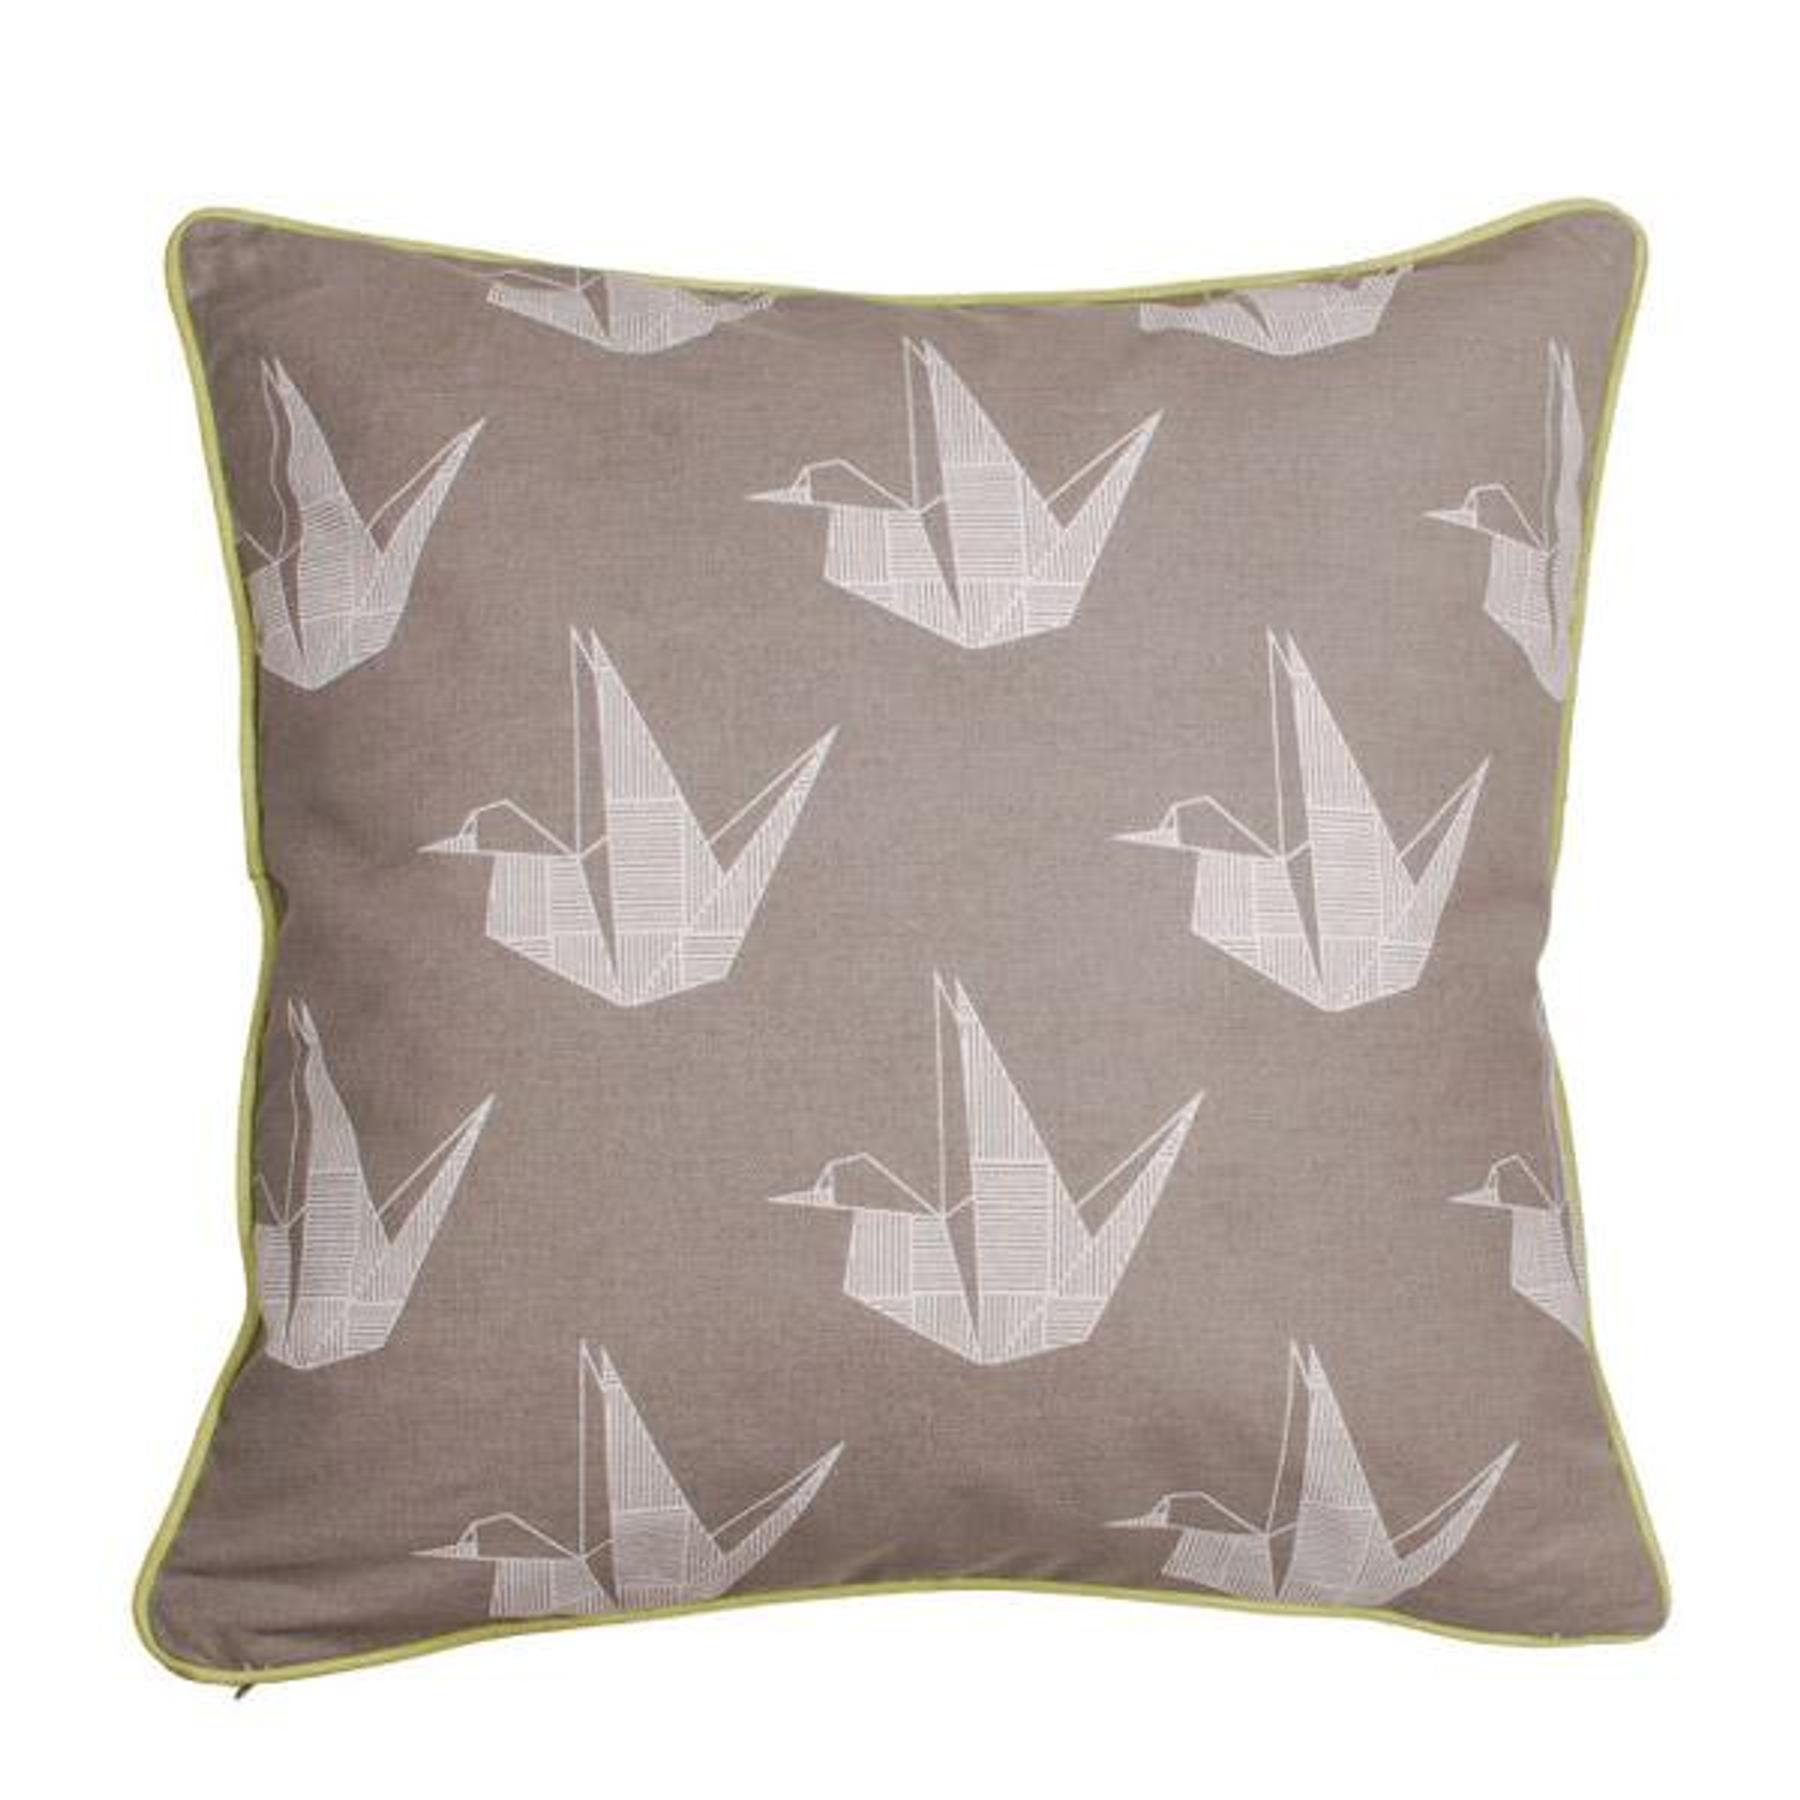 Aspegren Kissen Design Swan Hellbraunes Sofakissen Mit Origami